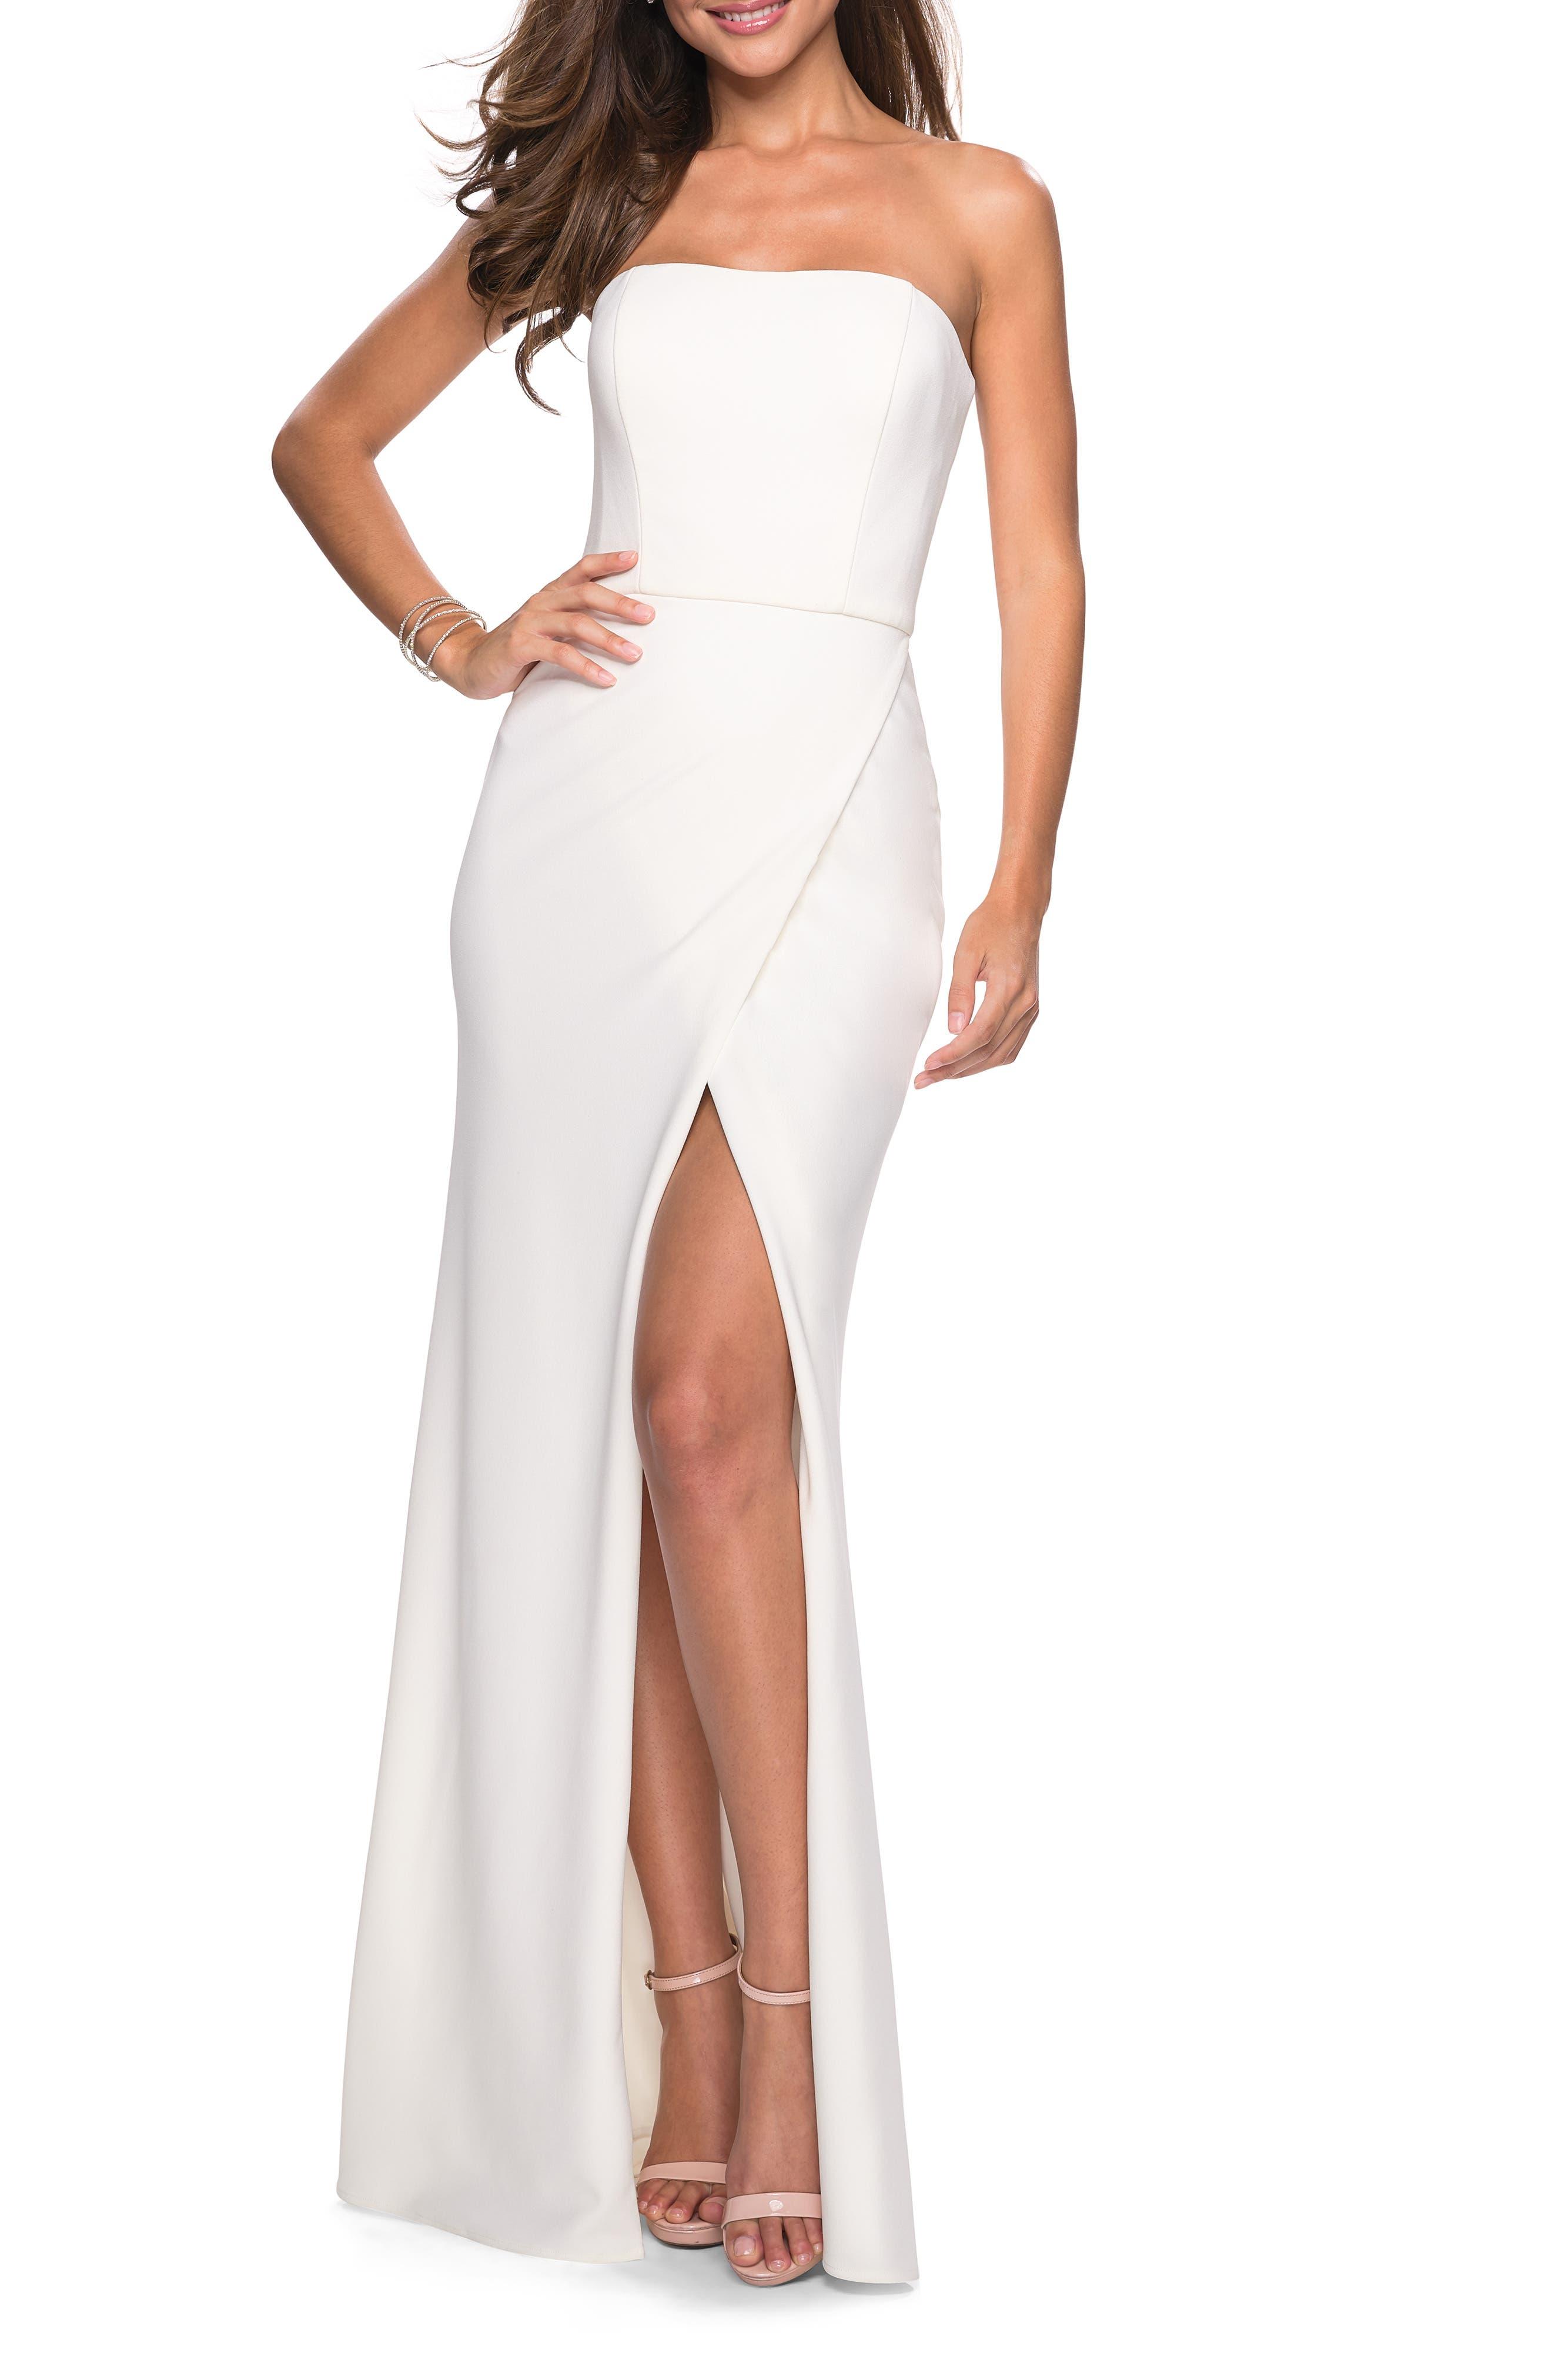 La Femme Strapless Jersey Evening Dress, White